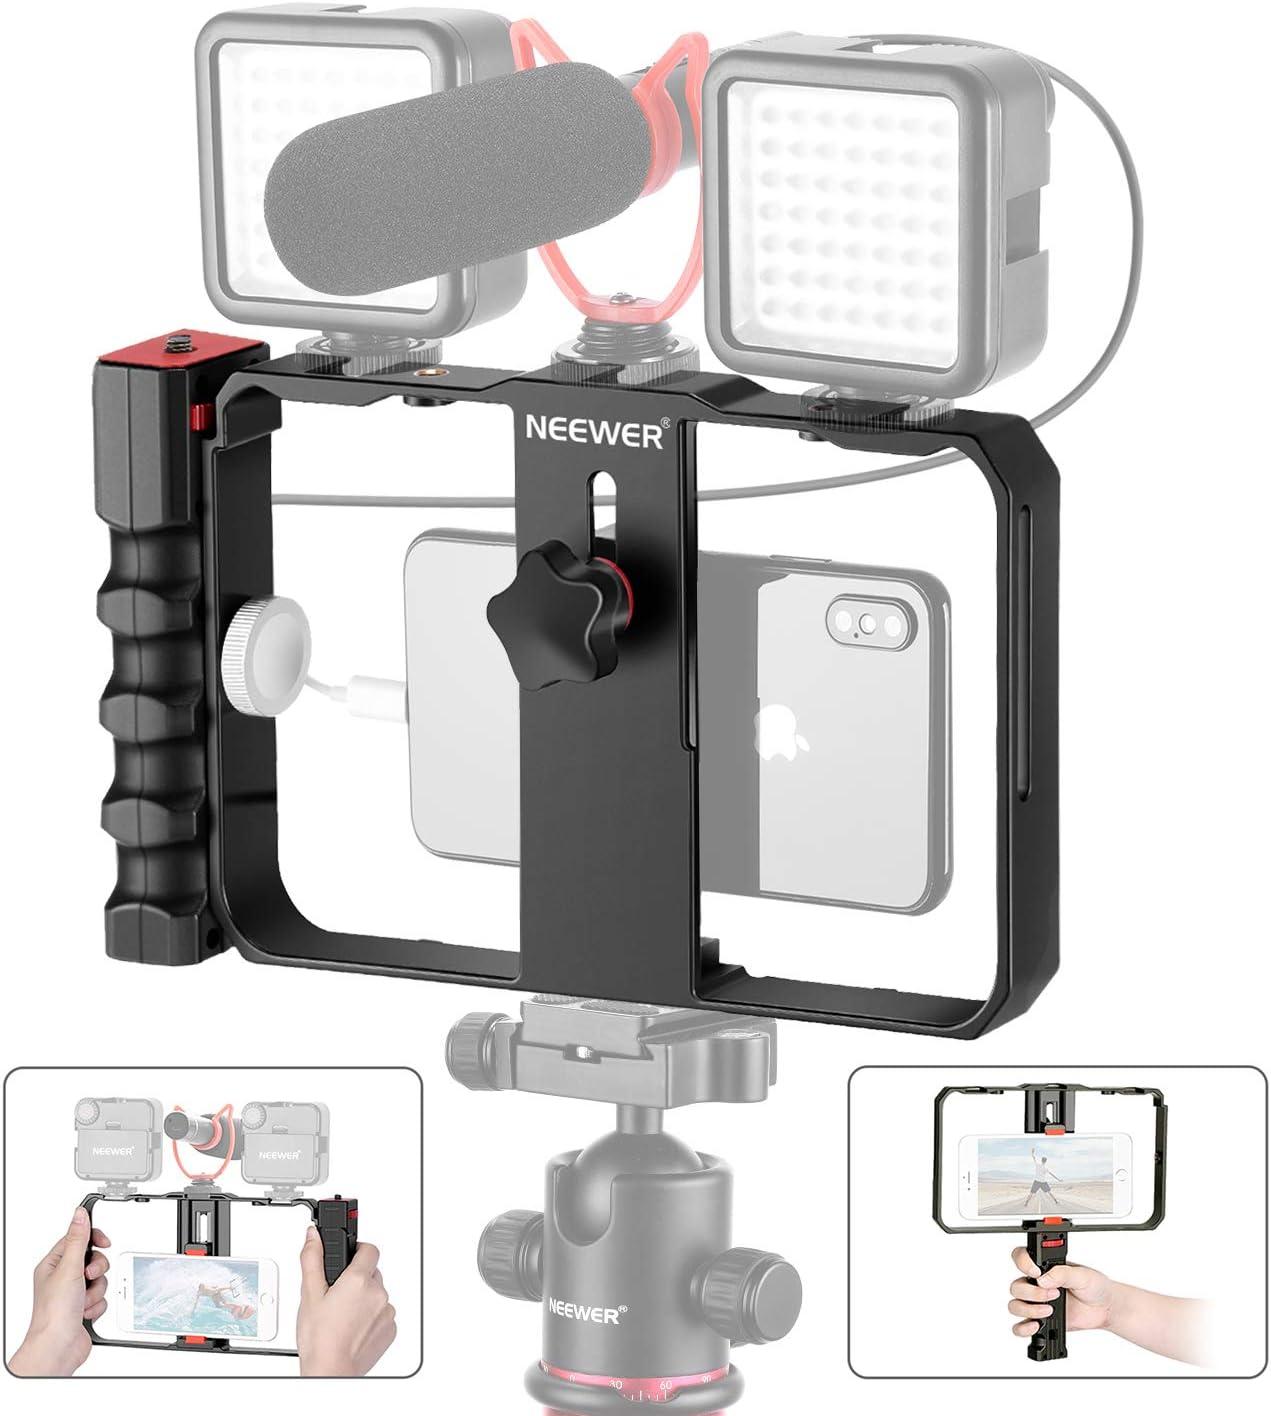 Neewer Smartphone Video Rig, Cassa per Cinematografia, Stabilizzatore per Smartphone Video, Treppiedi e Impugnatura per Ripresa di Video e Film, per iPhone 11 11 Pro 11 Pro Max X Xs HUAWEI Samsung